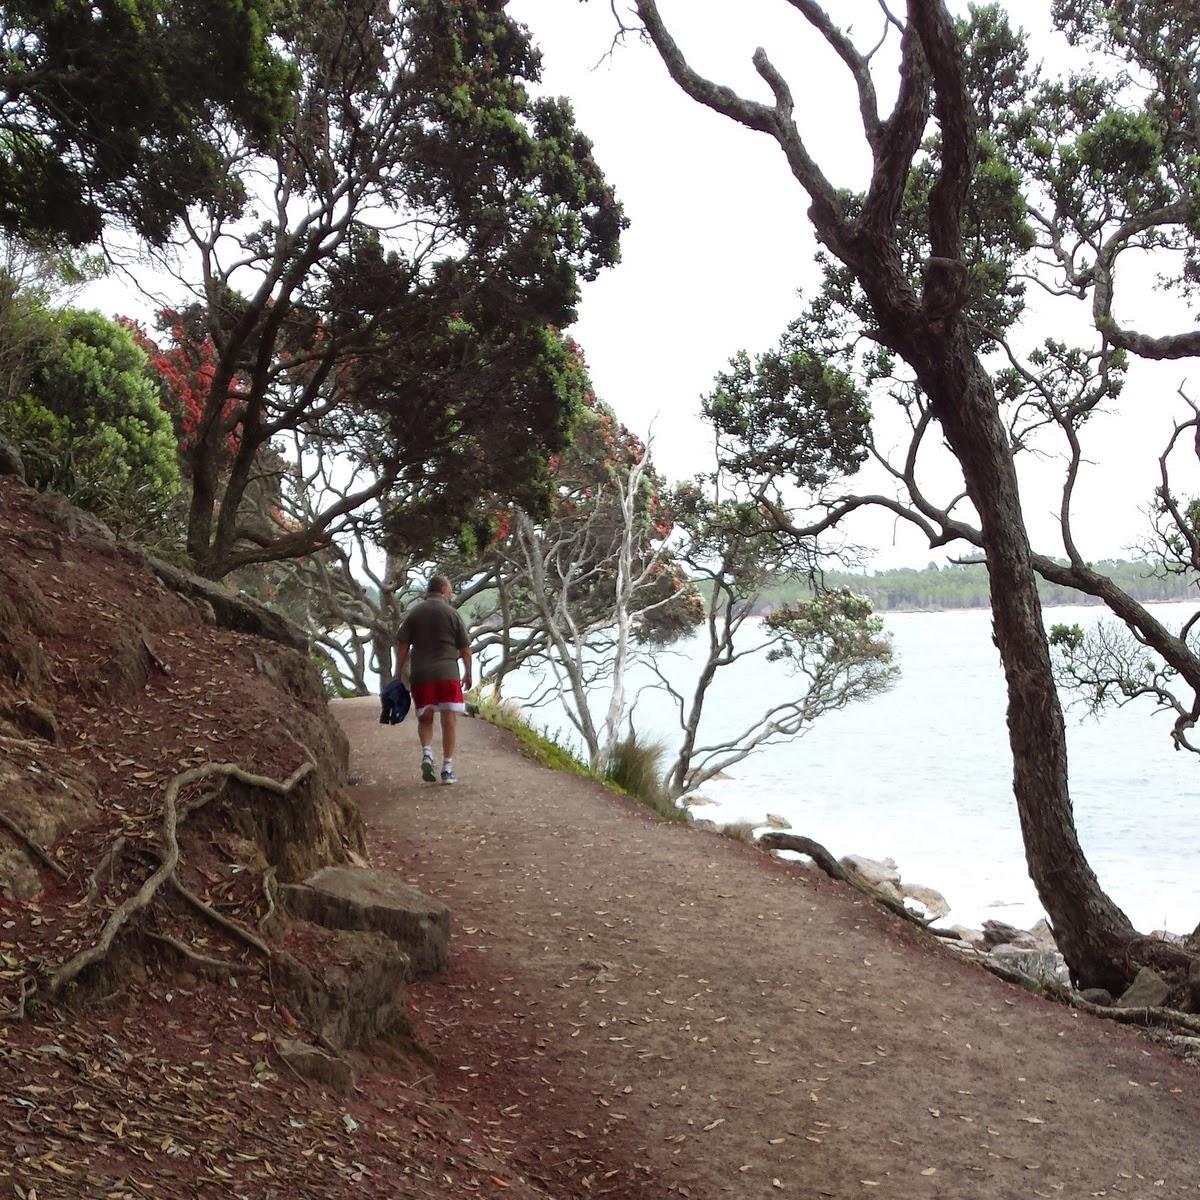 Mount Maunganui and pies - Christmas - Adventures of a London Kiwi